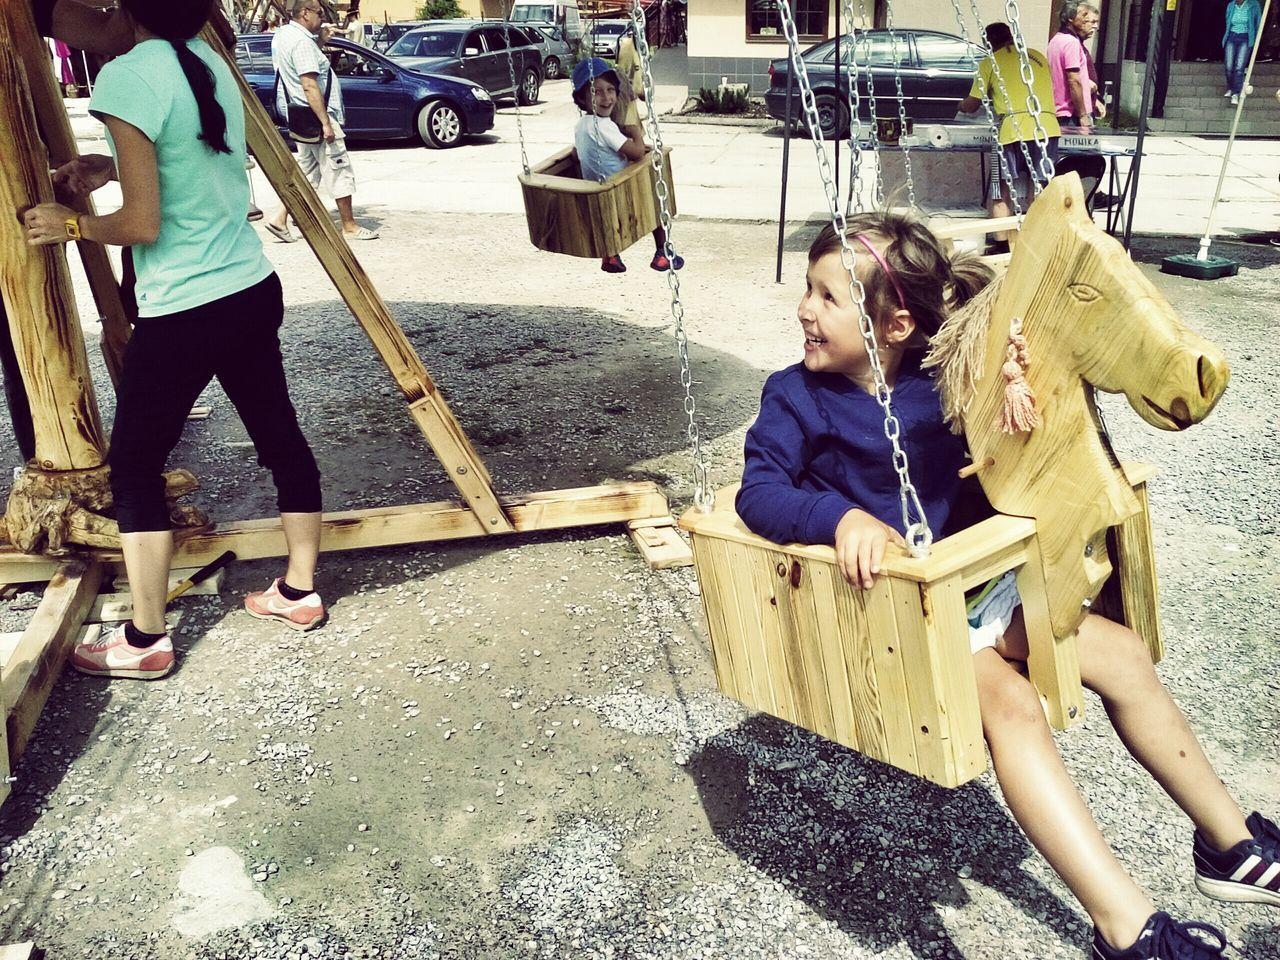 Man Powered Ecological Wooden Carousel Kids Having Fun Wooden Horse Enjoy Your Ride